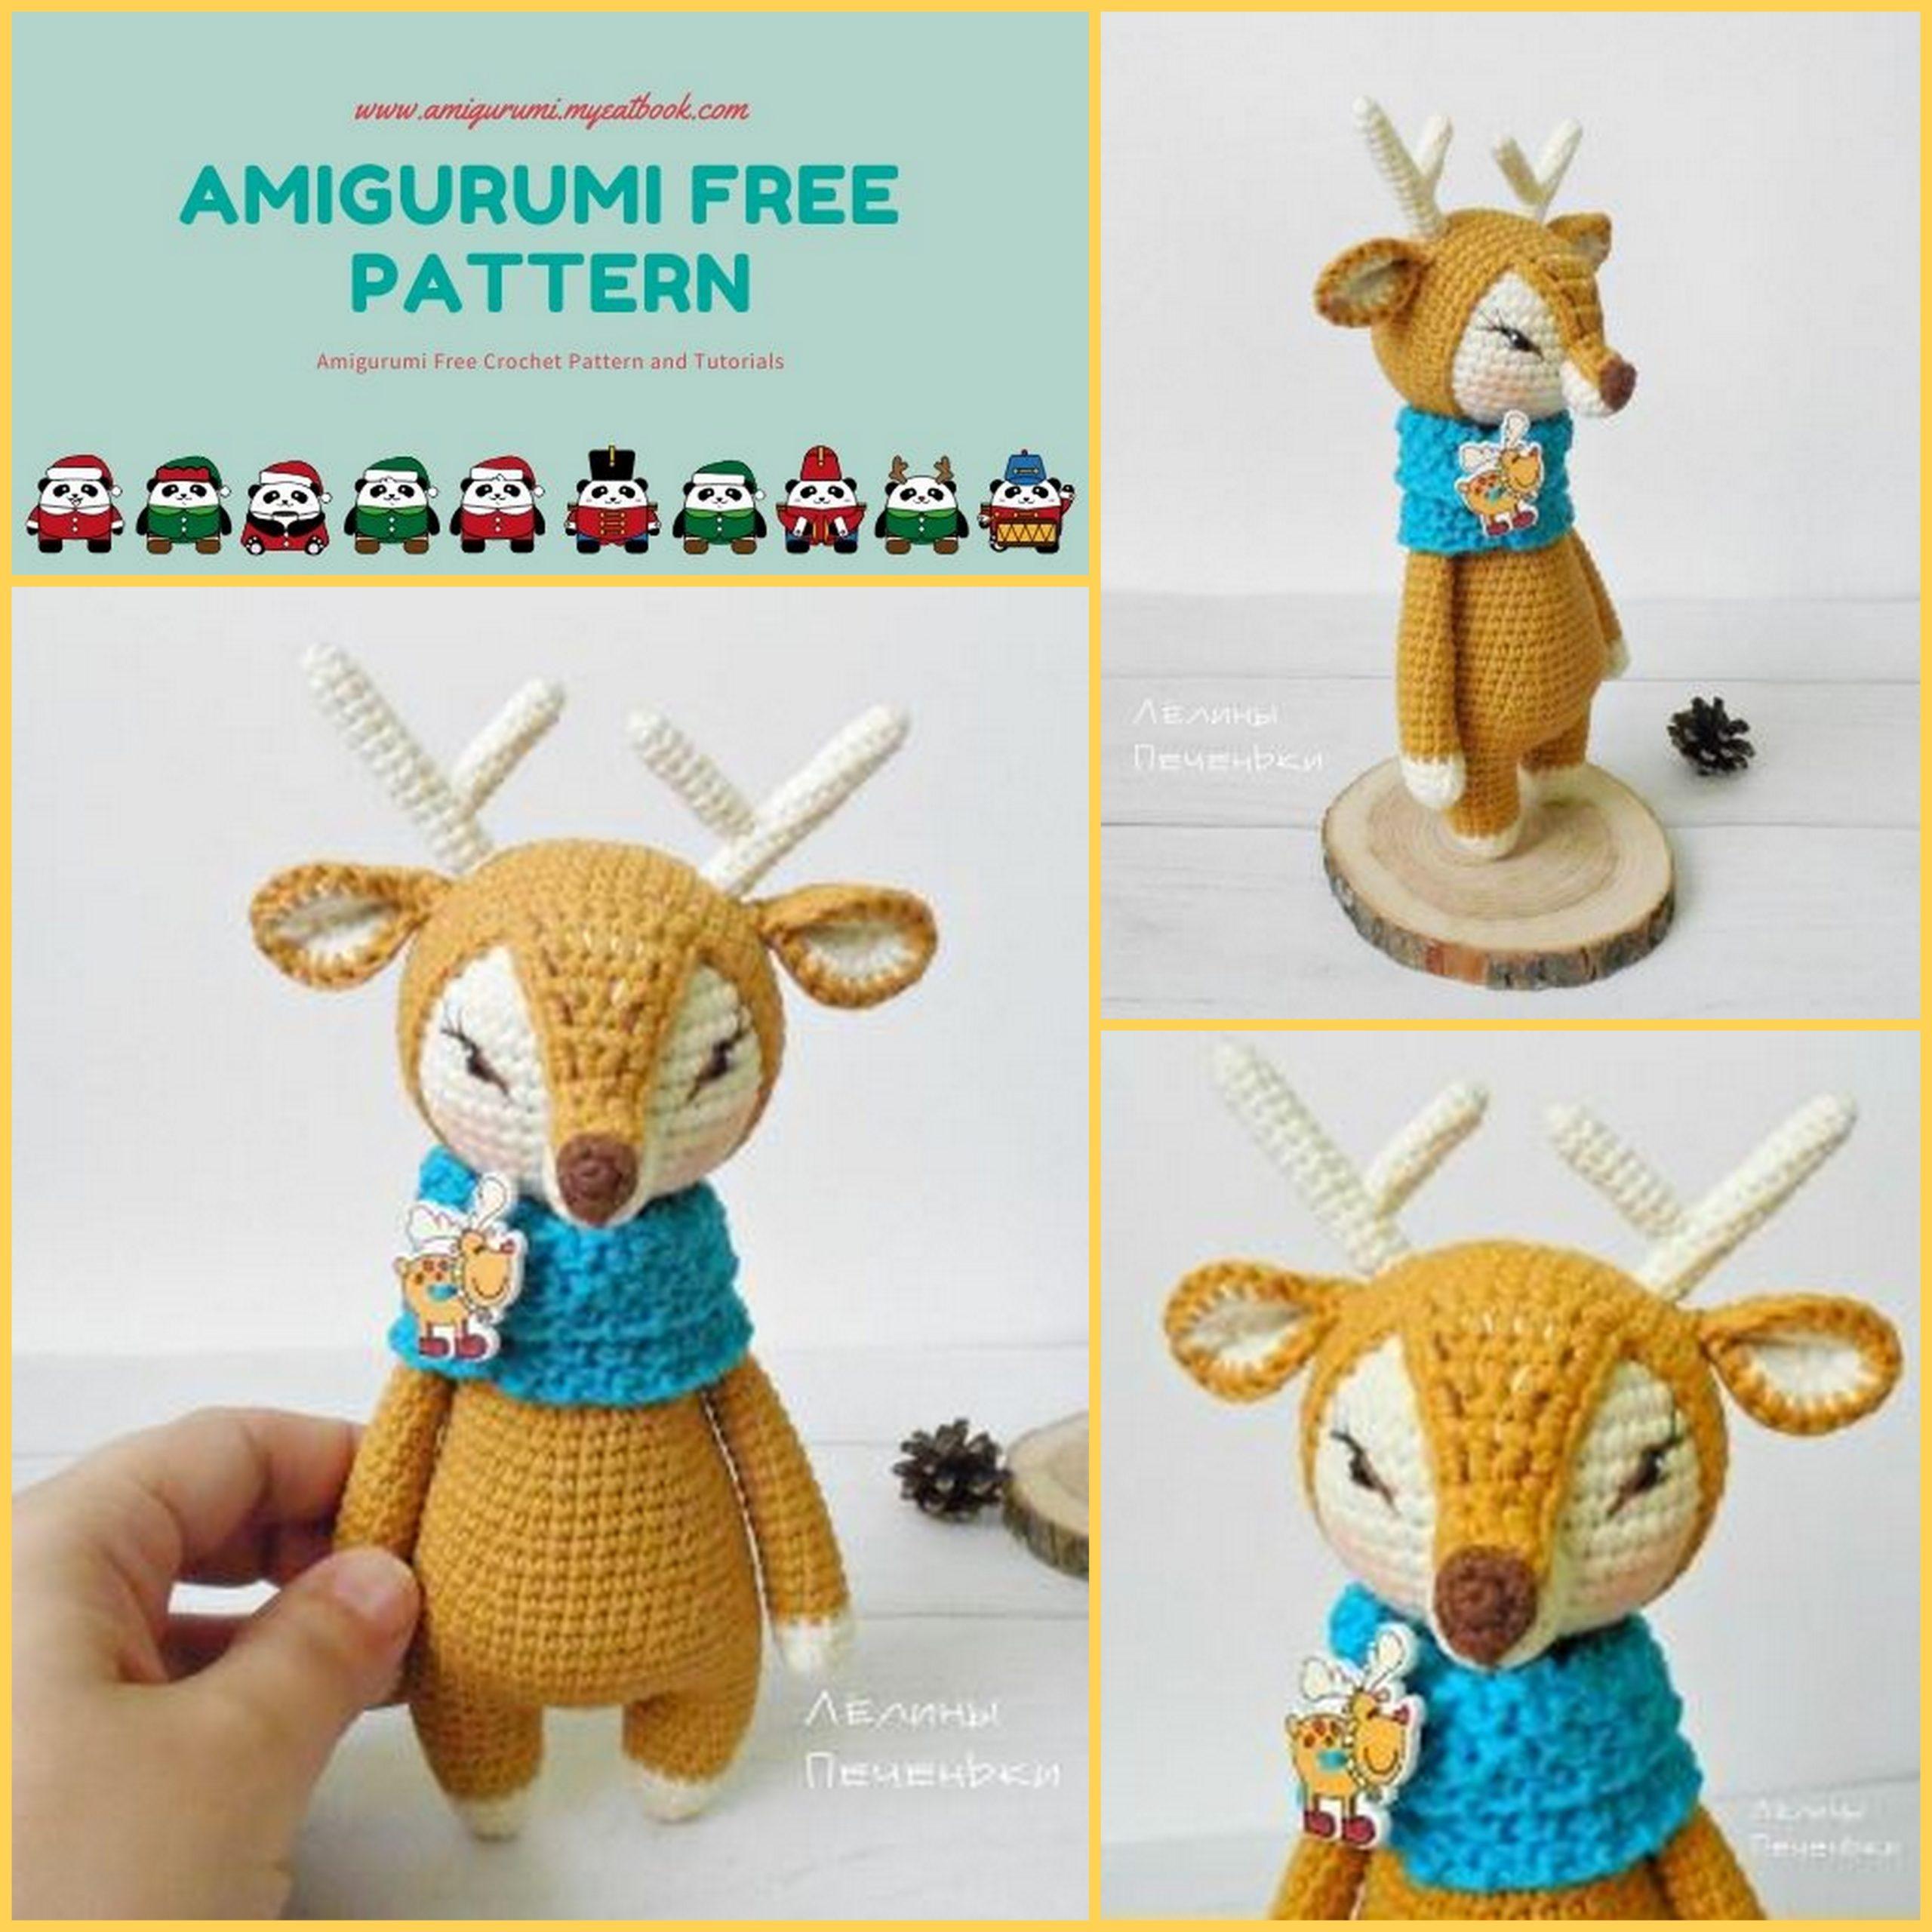 Amigurumi Reindeer - A Free Crochet Pattern | Christmas crochet ... | 2560x2560